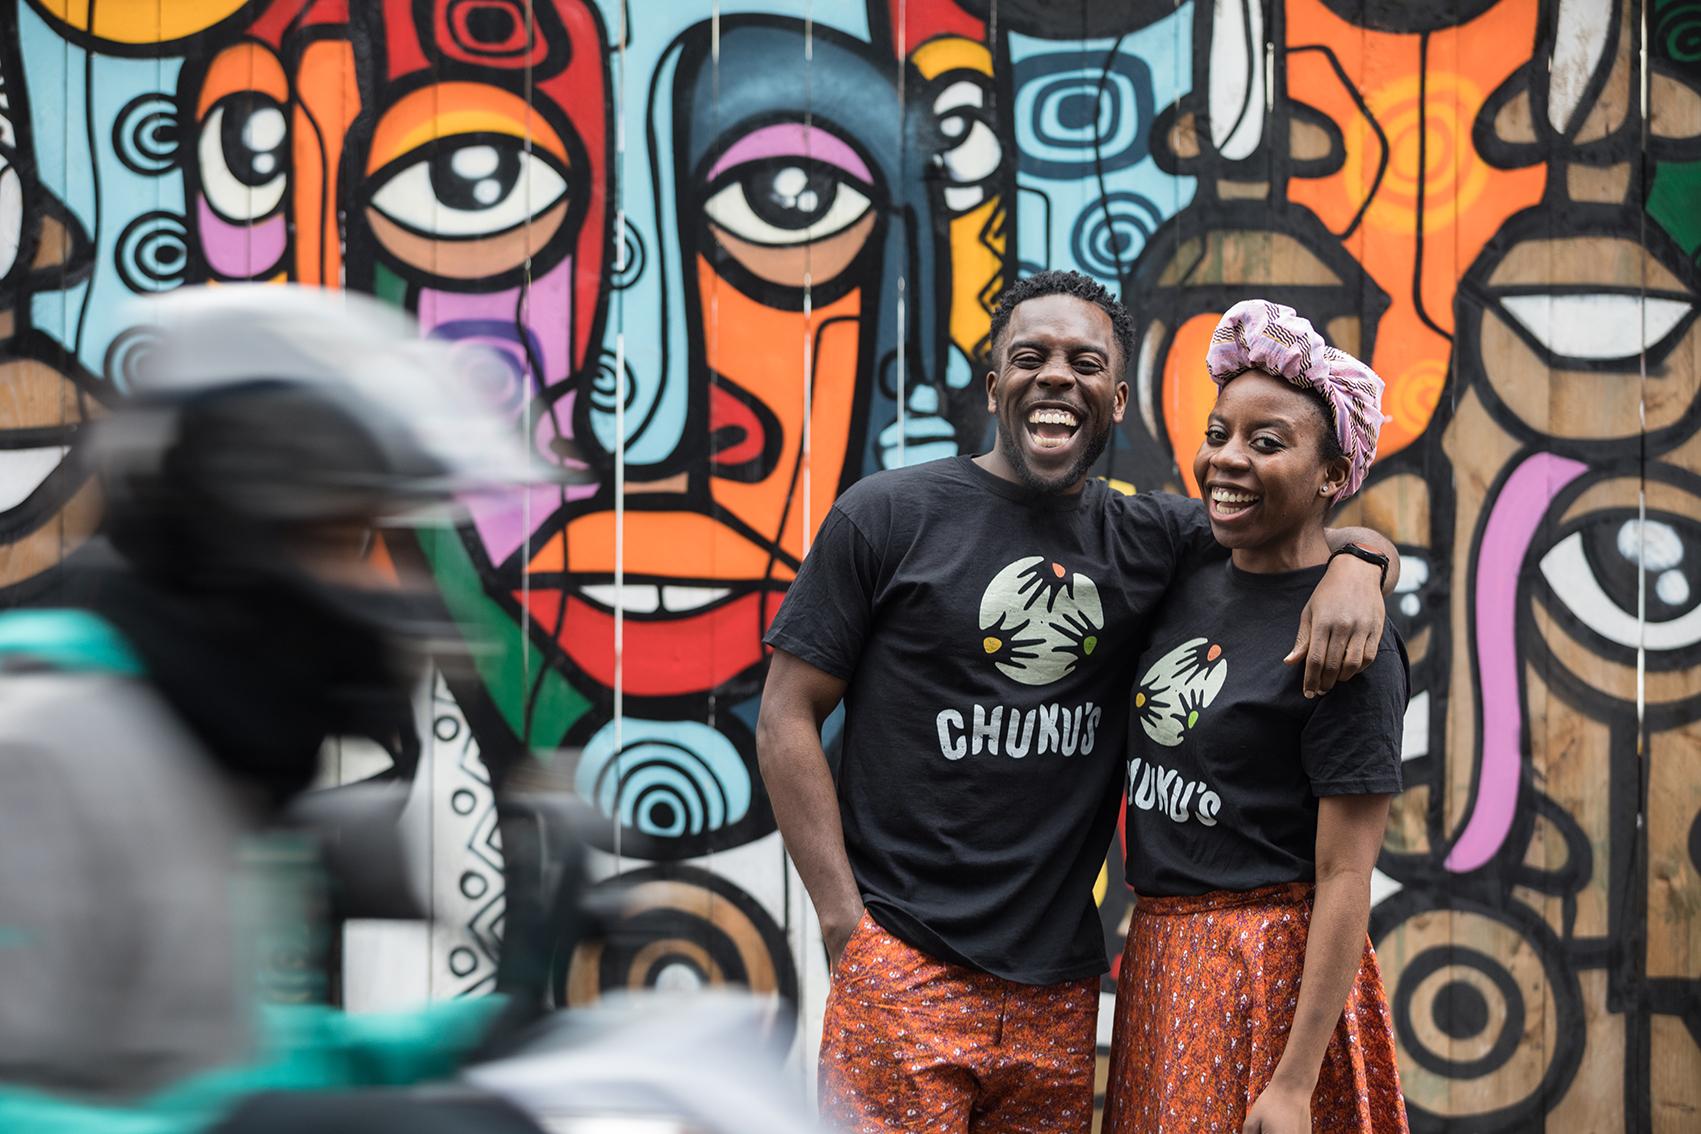 Chuku's founders Emeka and Ifeyinwa